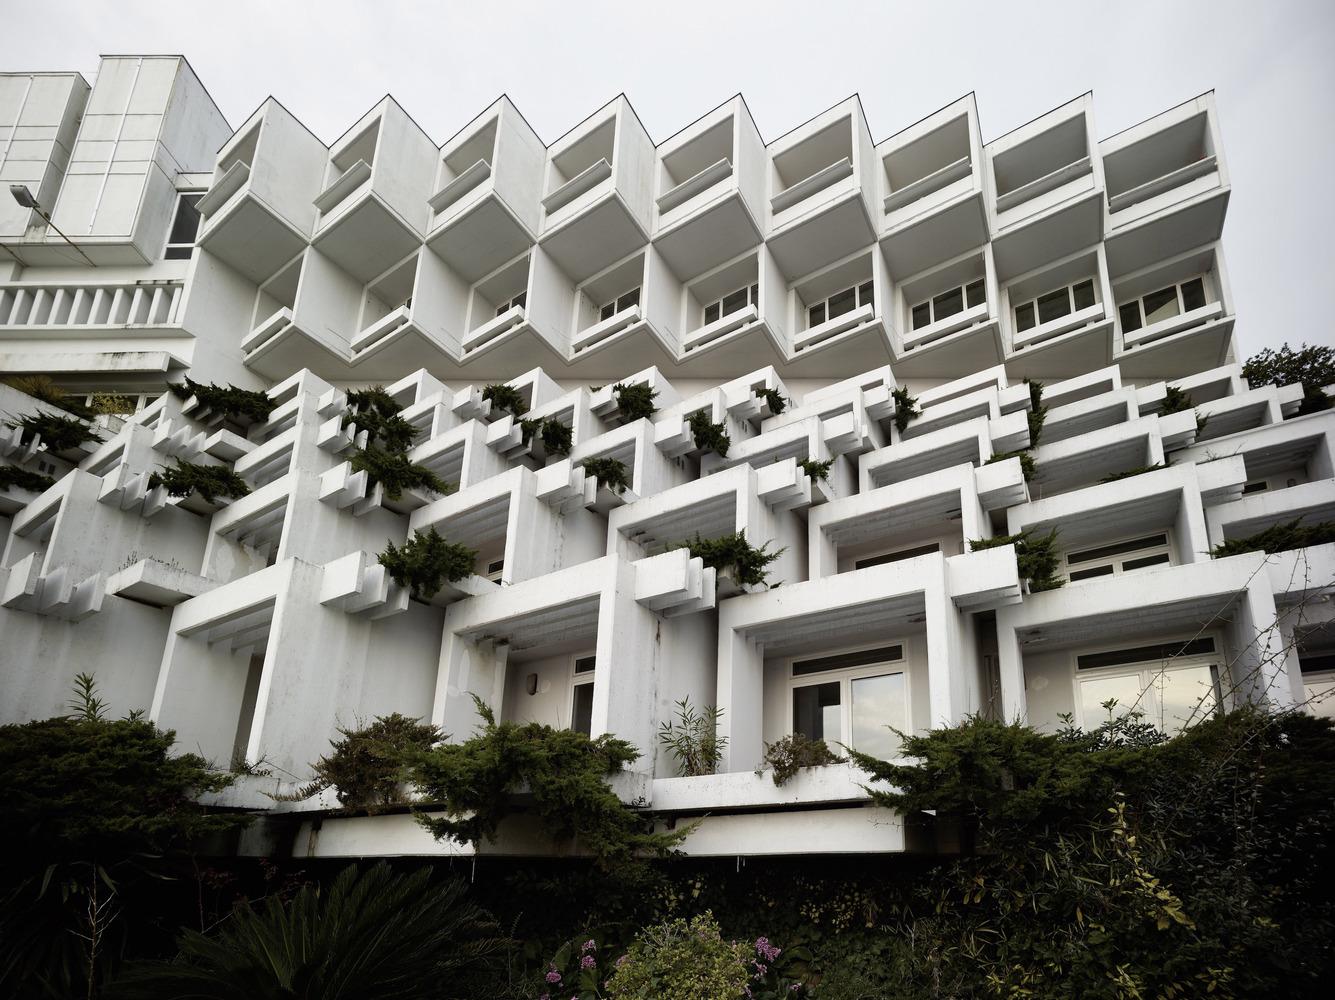 Branko Žnidarec / Ξενοδοχείο Adriatic II, 1970–71 / Οπατίγια, Κροατία / Φωτό: Valentin Jeck